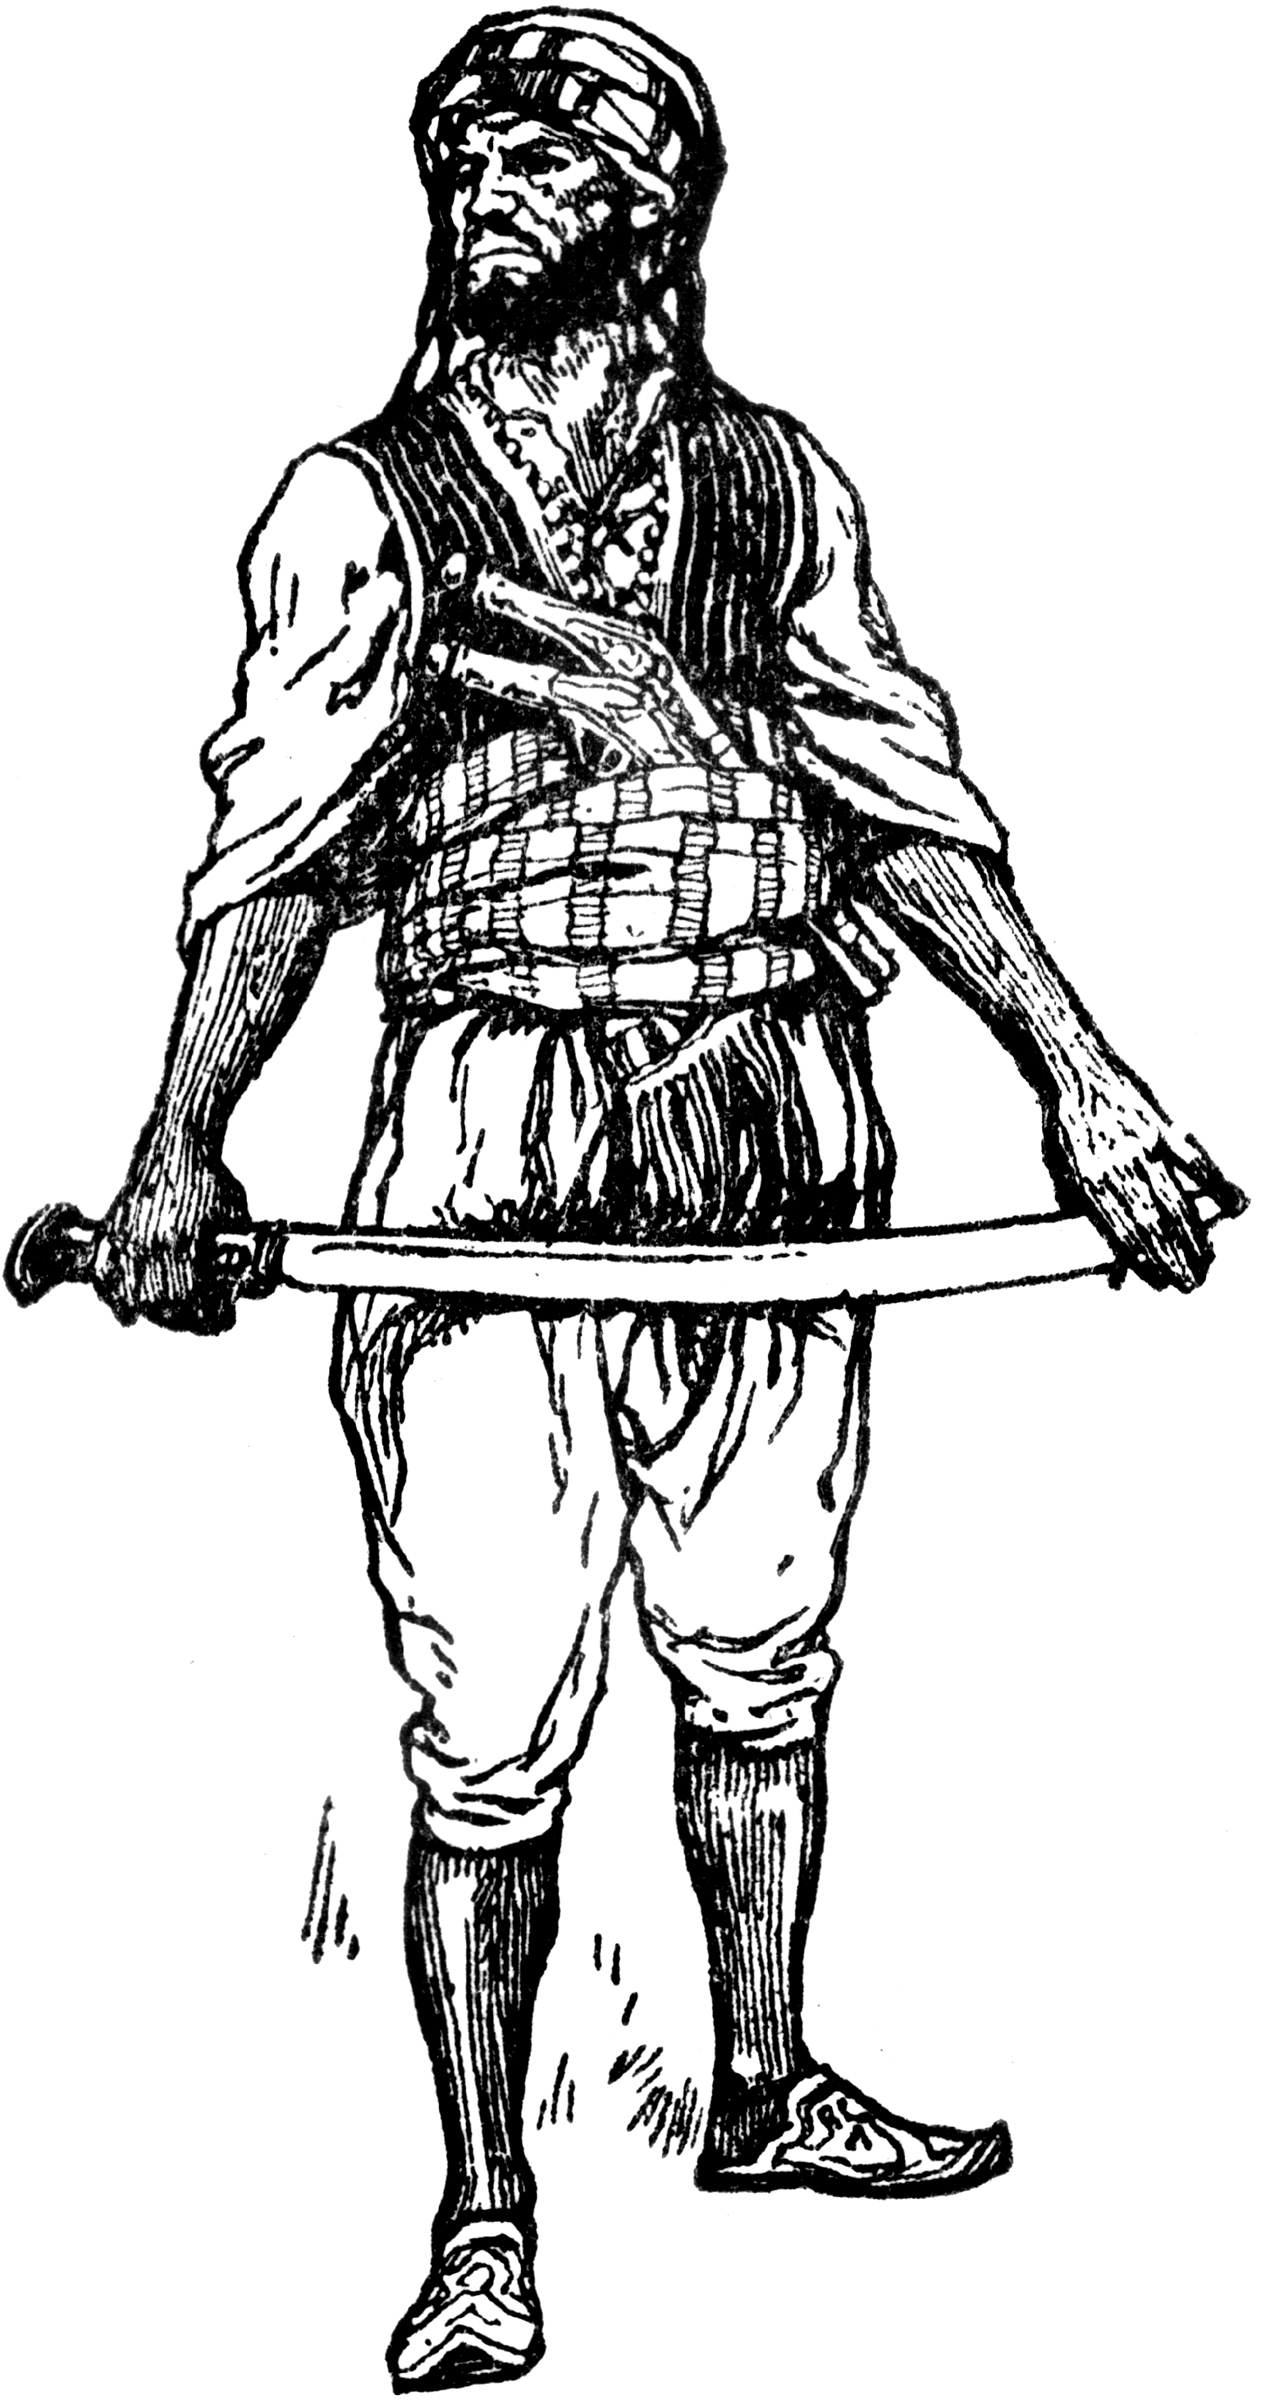 pirate_22367.jpg